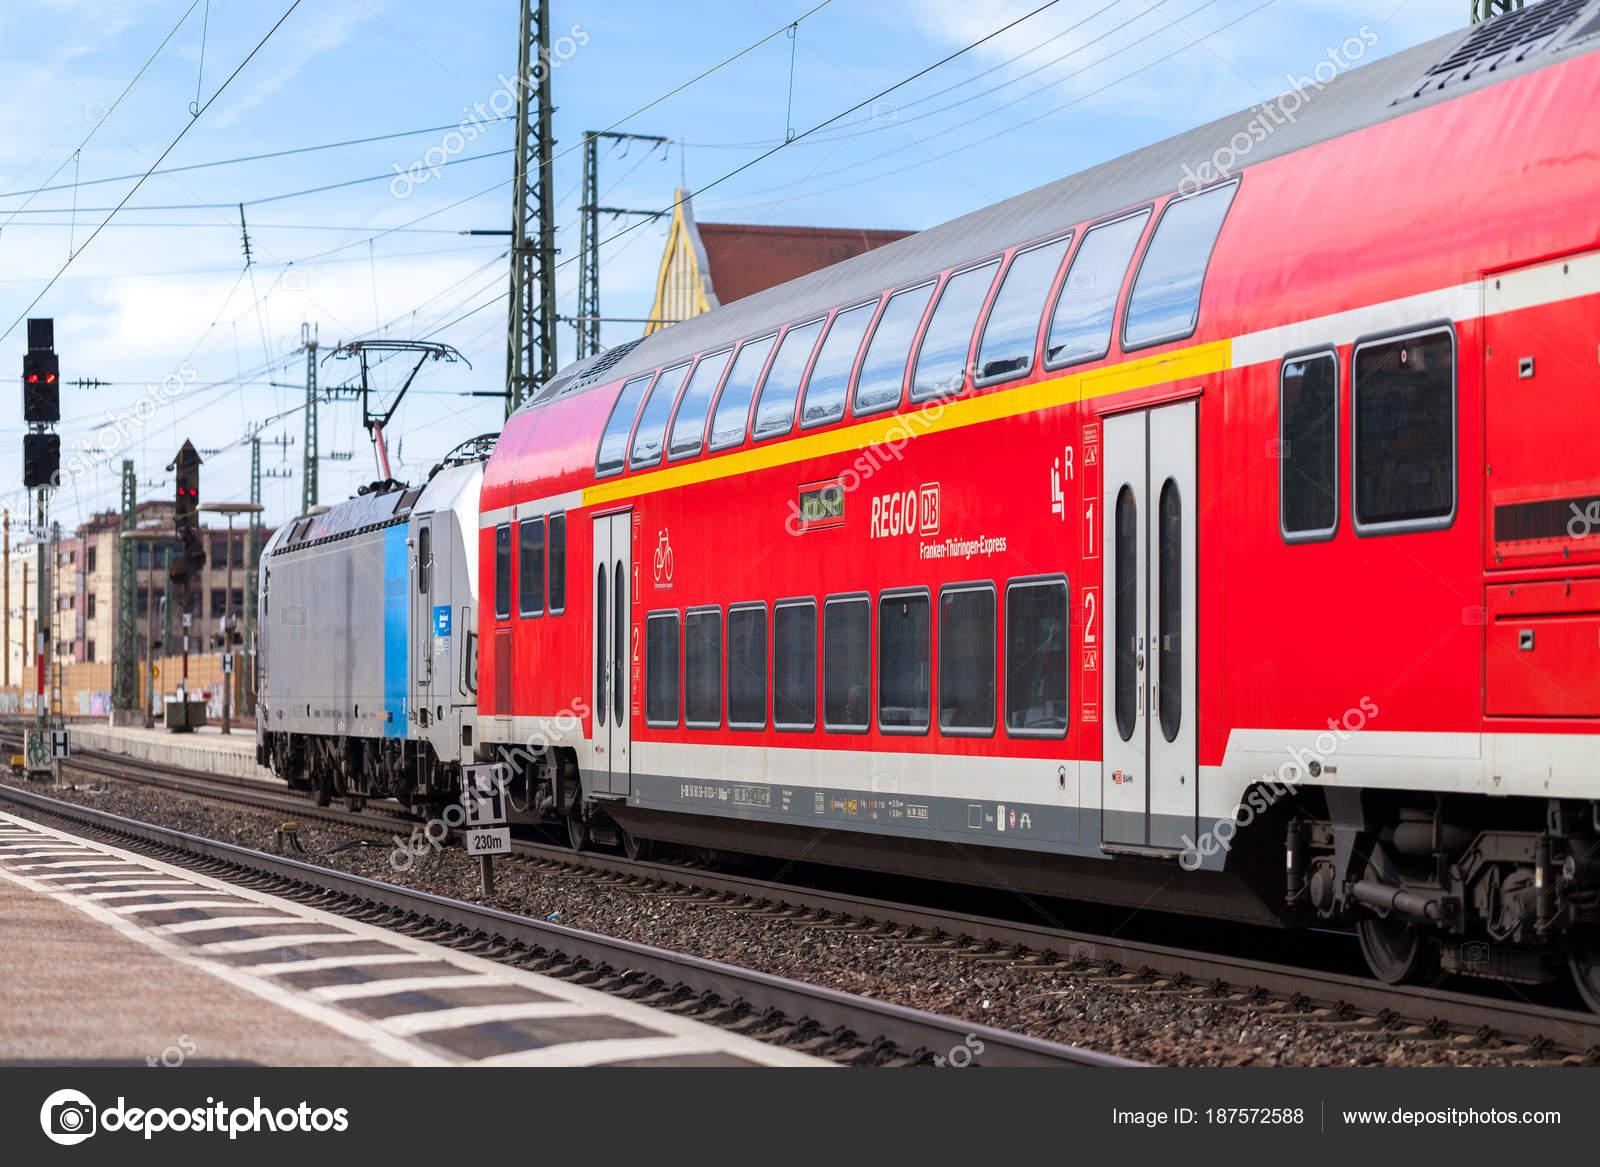 https://st3.depositphotos.com/7447086/18757/i/1600/depositphotos_187572588-stock-photo-fuerth-germany-march-2018-regional.jpg